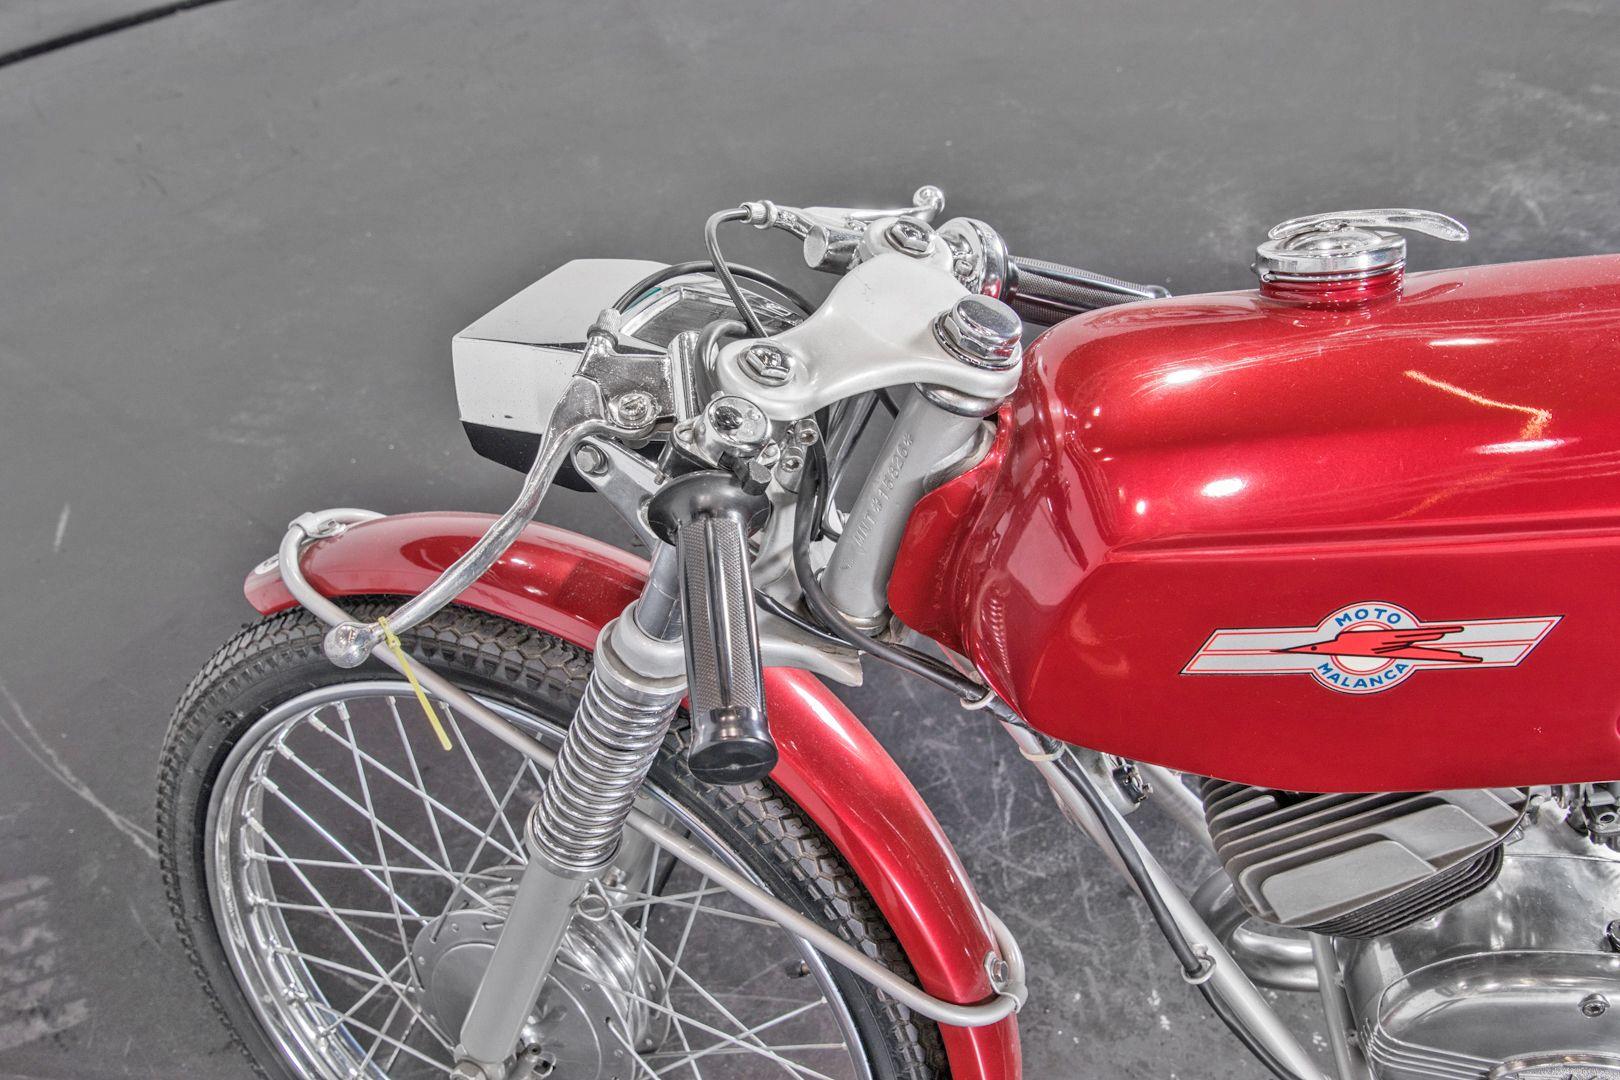 1963 Malanca Nicky 50 41167